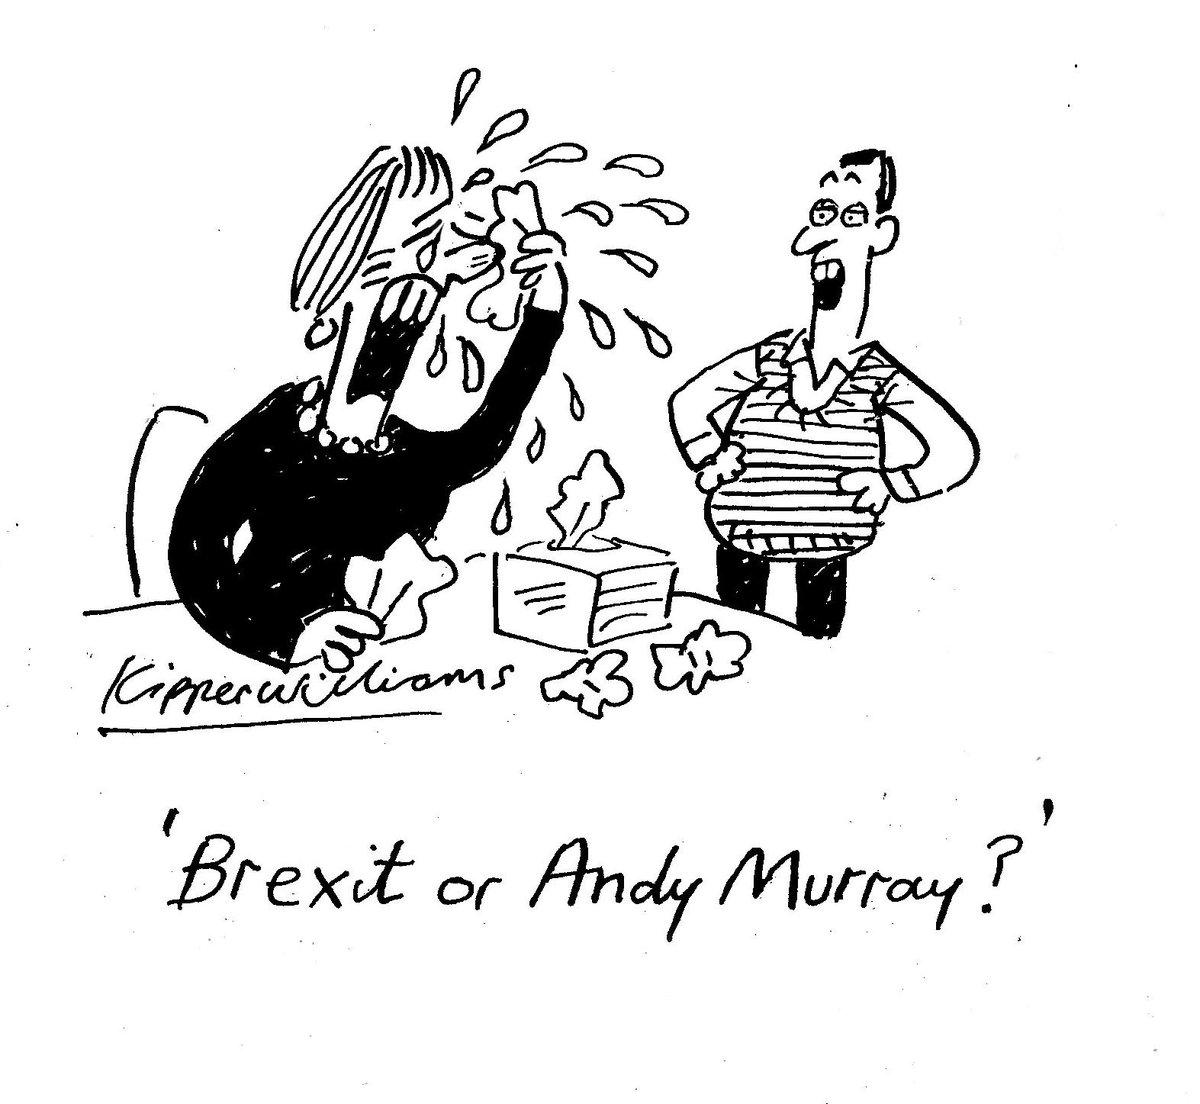 RT @KipperWilliams: My @spectator @SpecCartoons cartoon #Brexit #AndyMurray https://t.co/wkX1v4XwXX